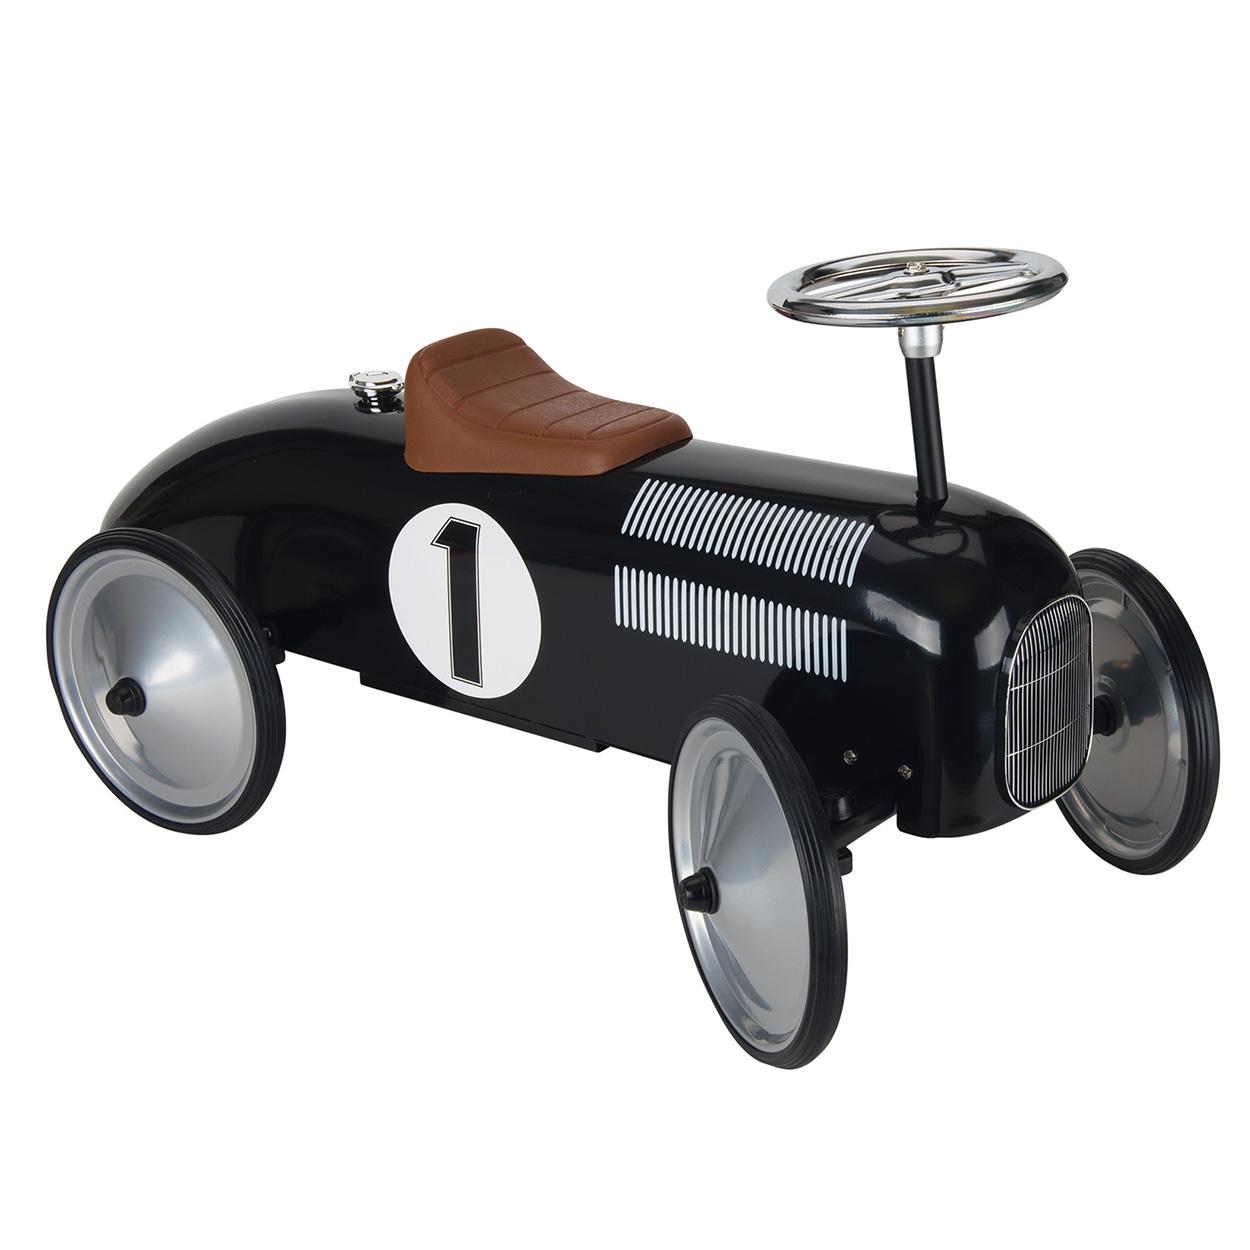 Retro loopauto zwart